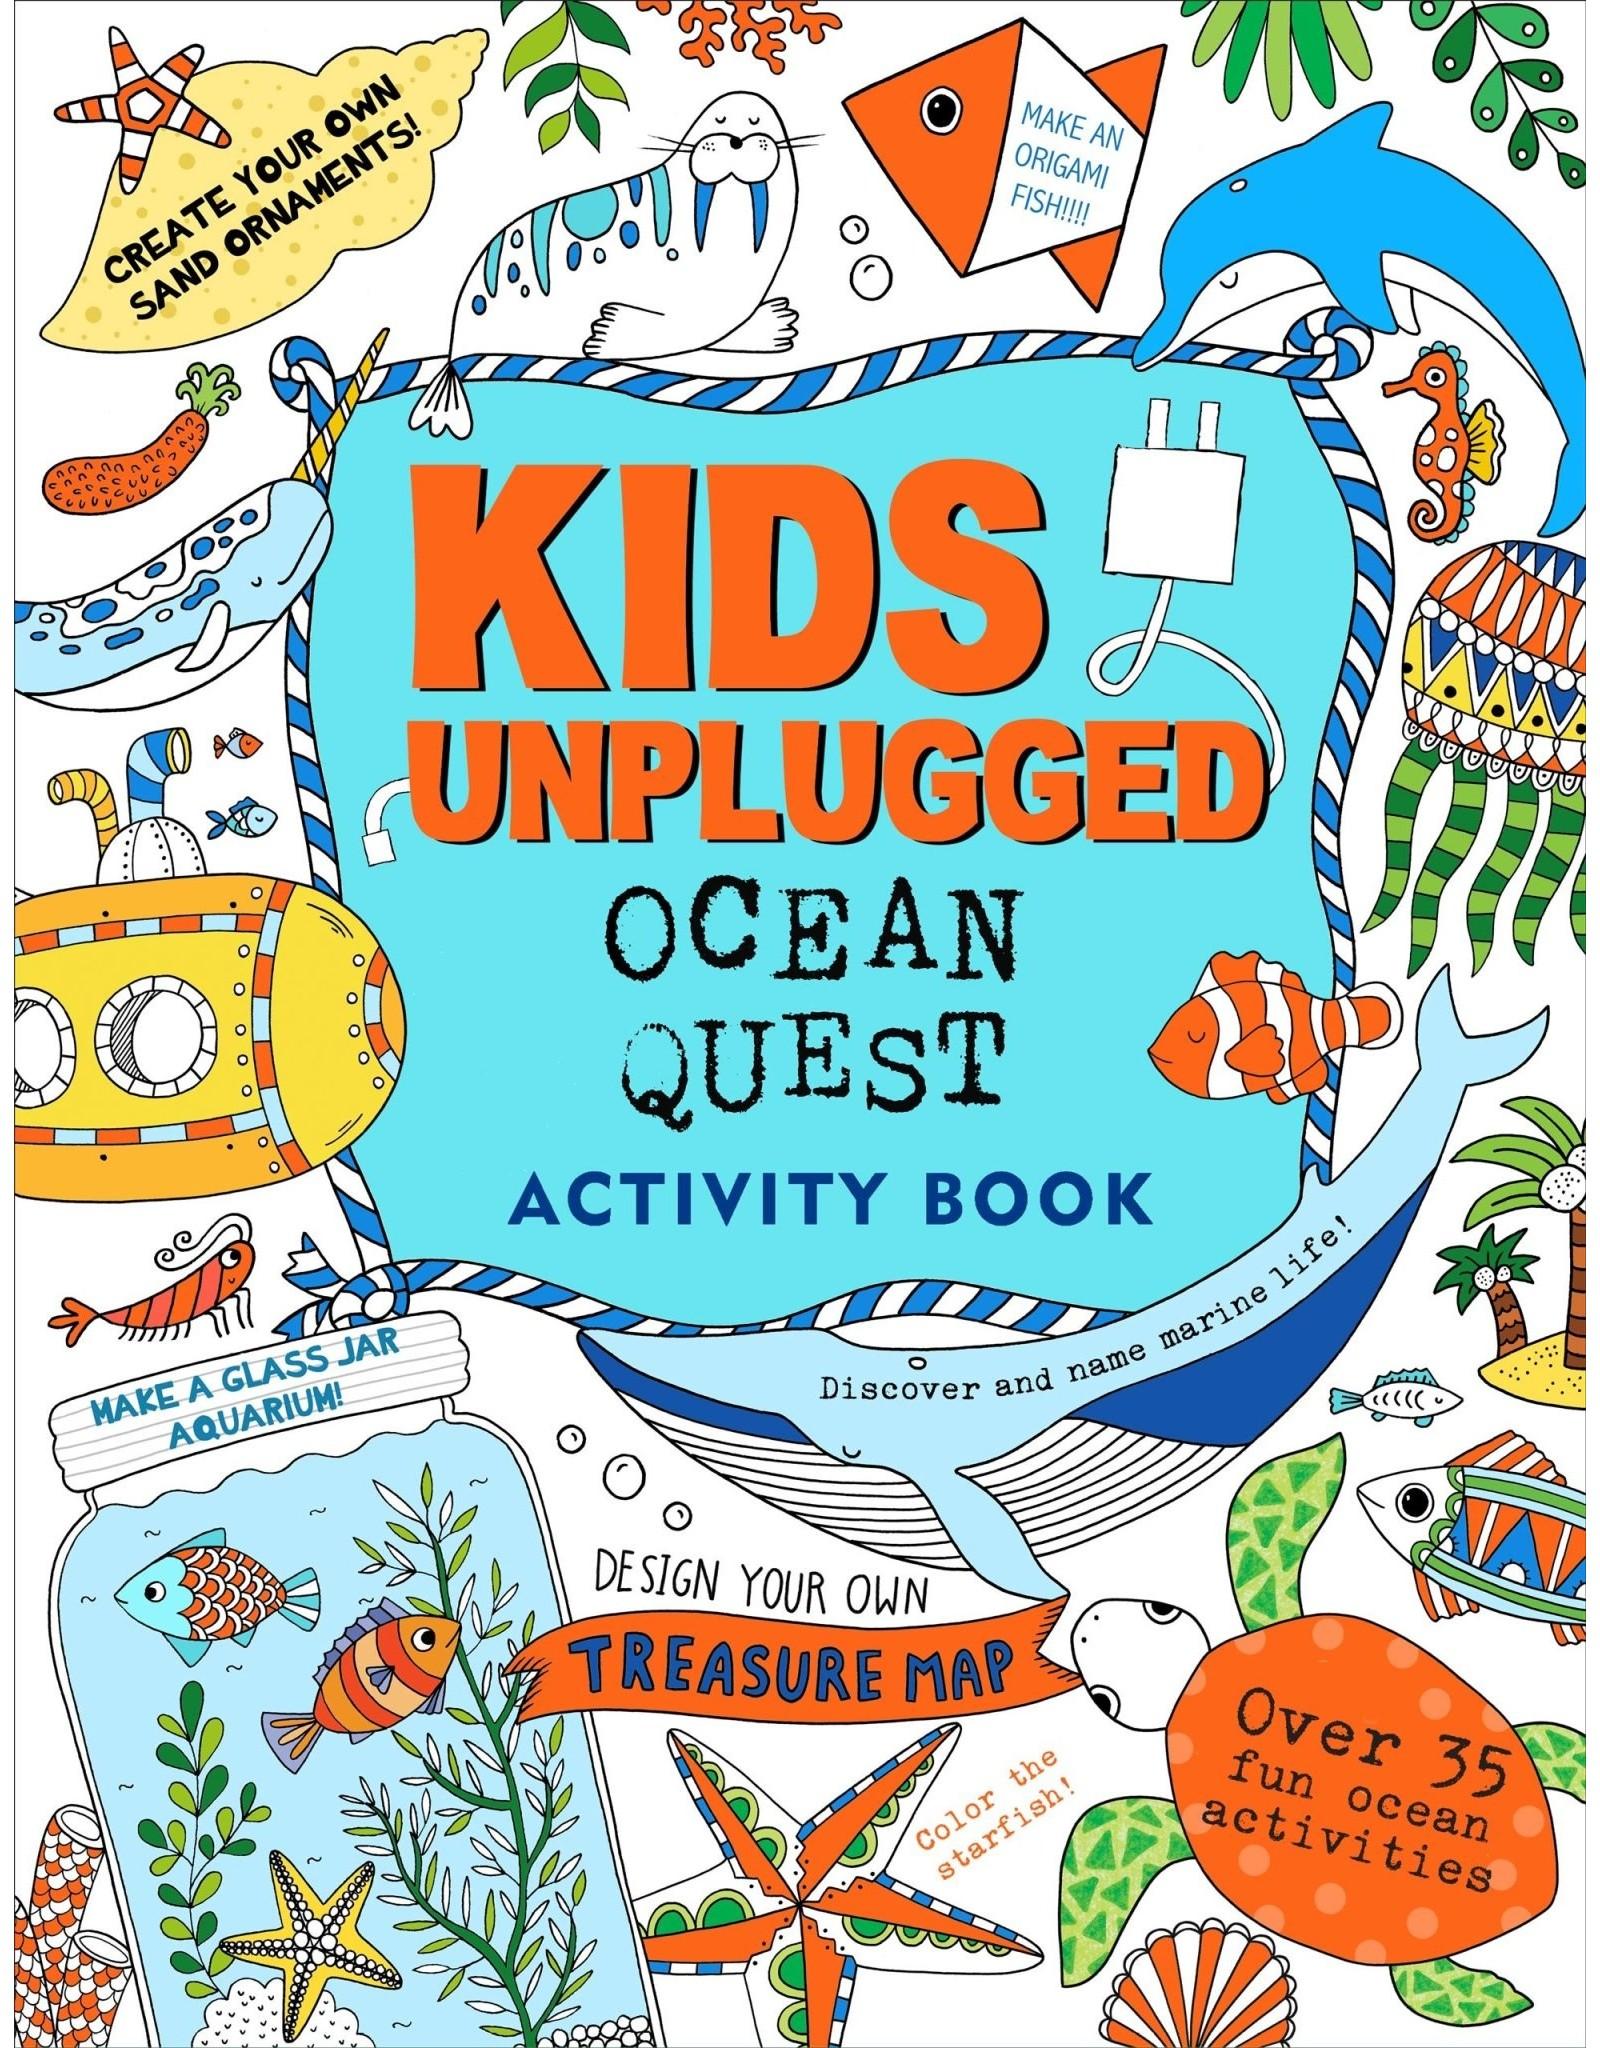 Kids Unplugged: Ocean Quest